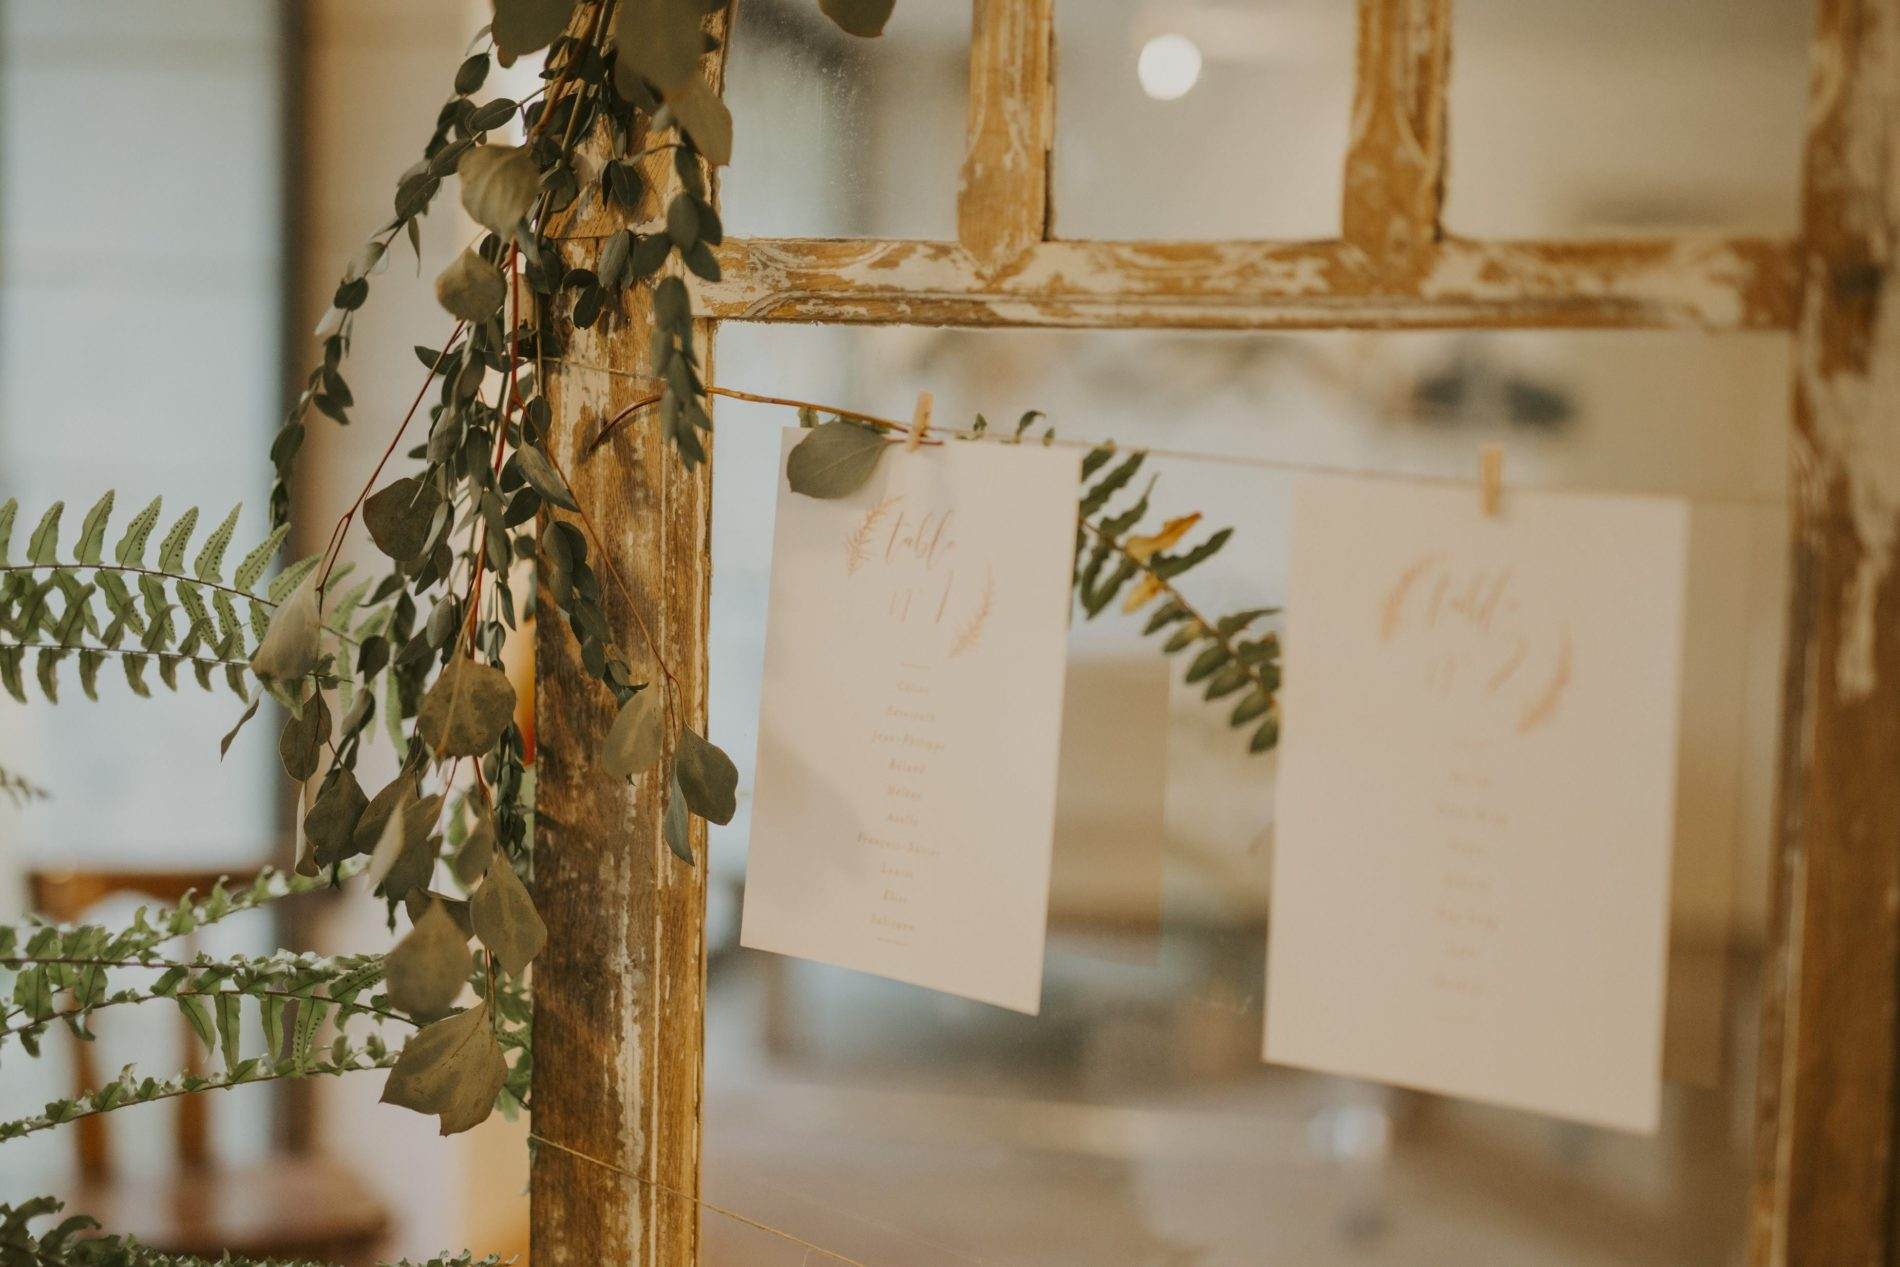 0156_04-CelineSereivuth-158-obonheurdesdames-decoration-mariage-location-Jordane-Chaillou